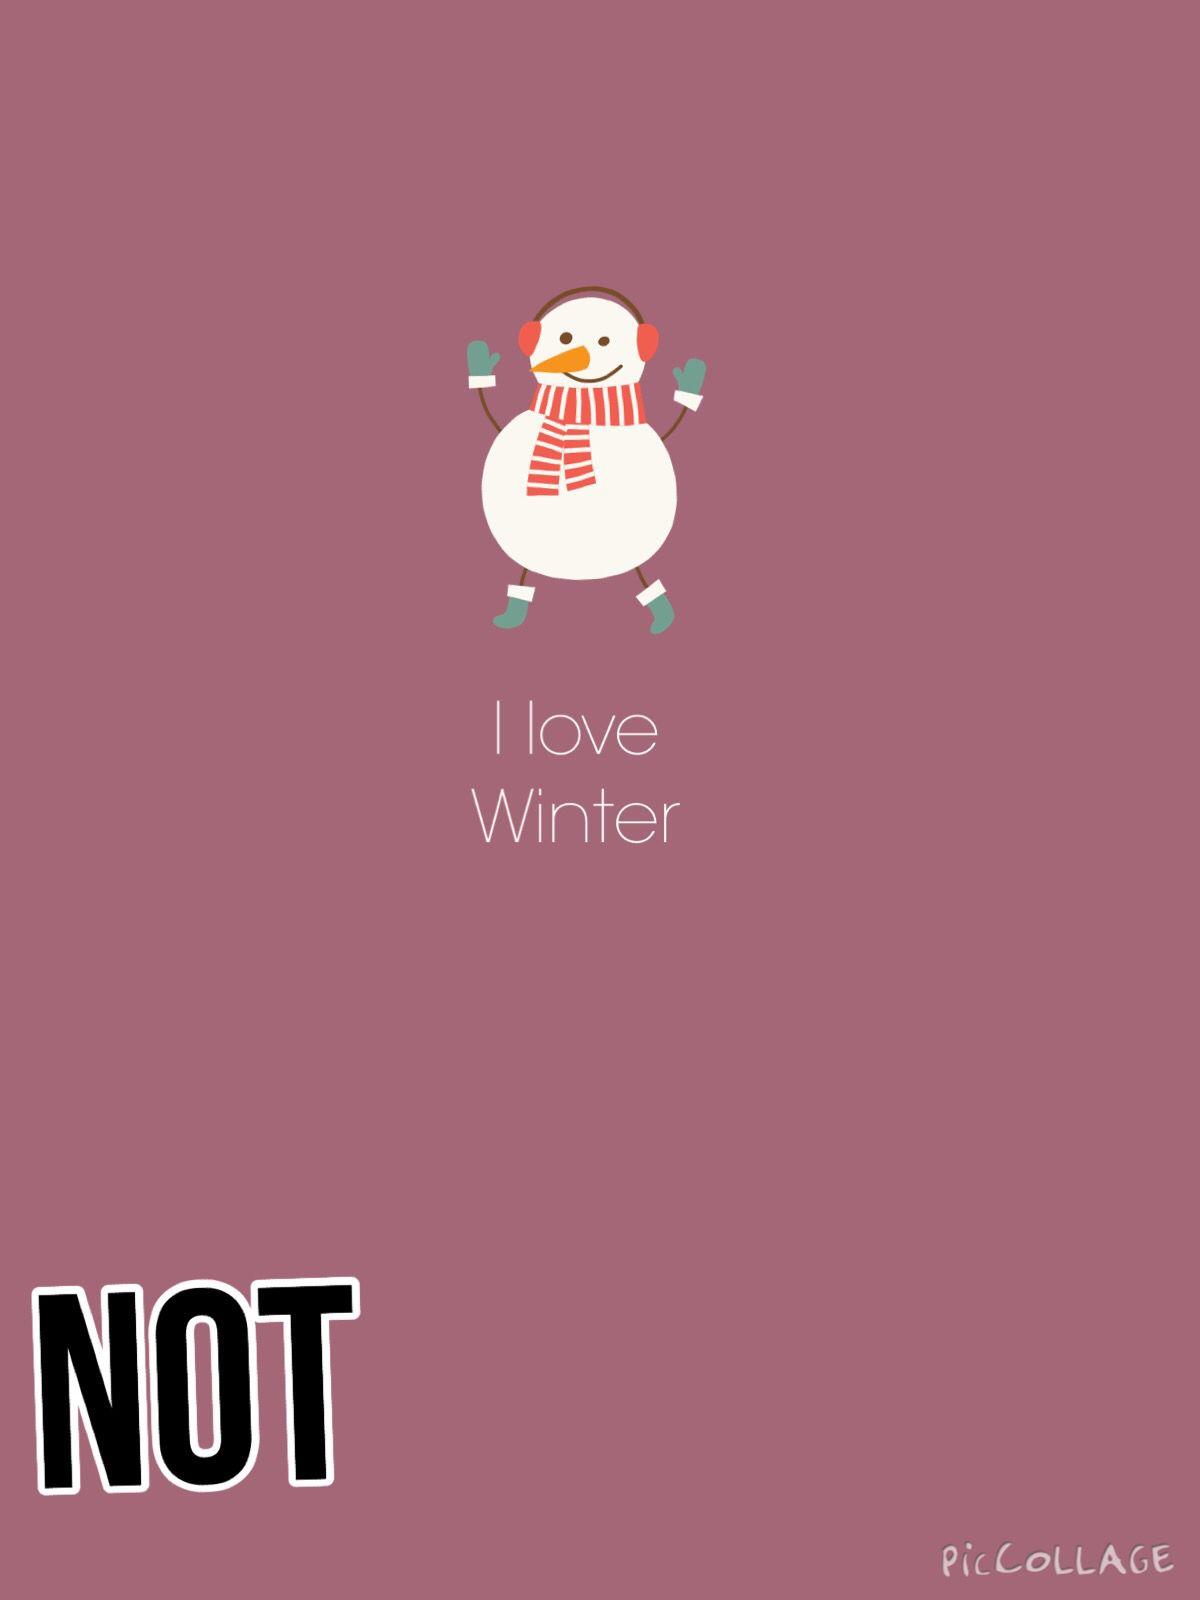 I love winter NOT